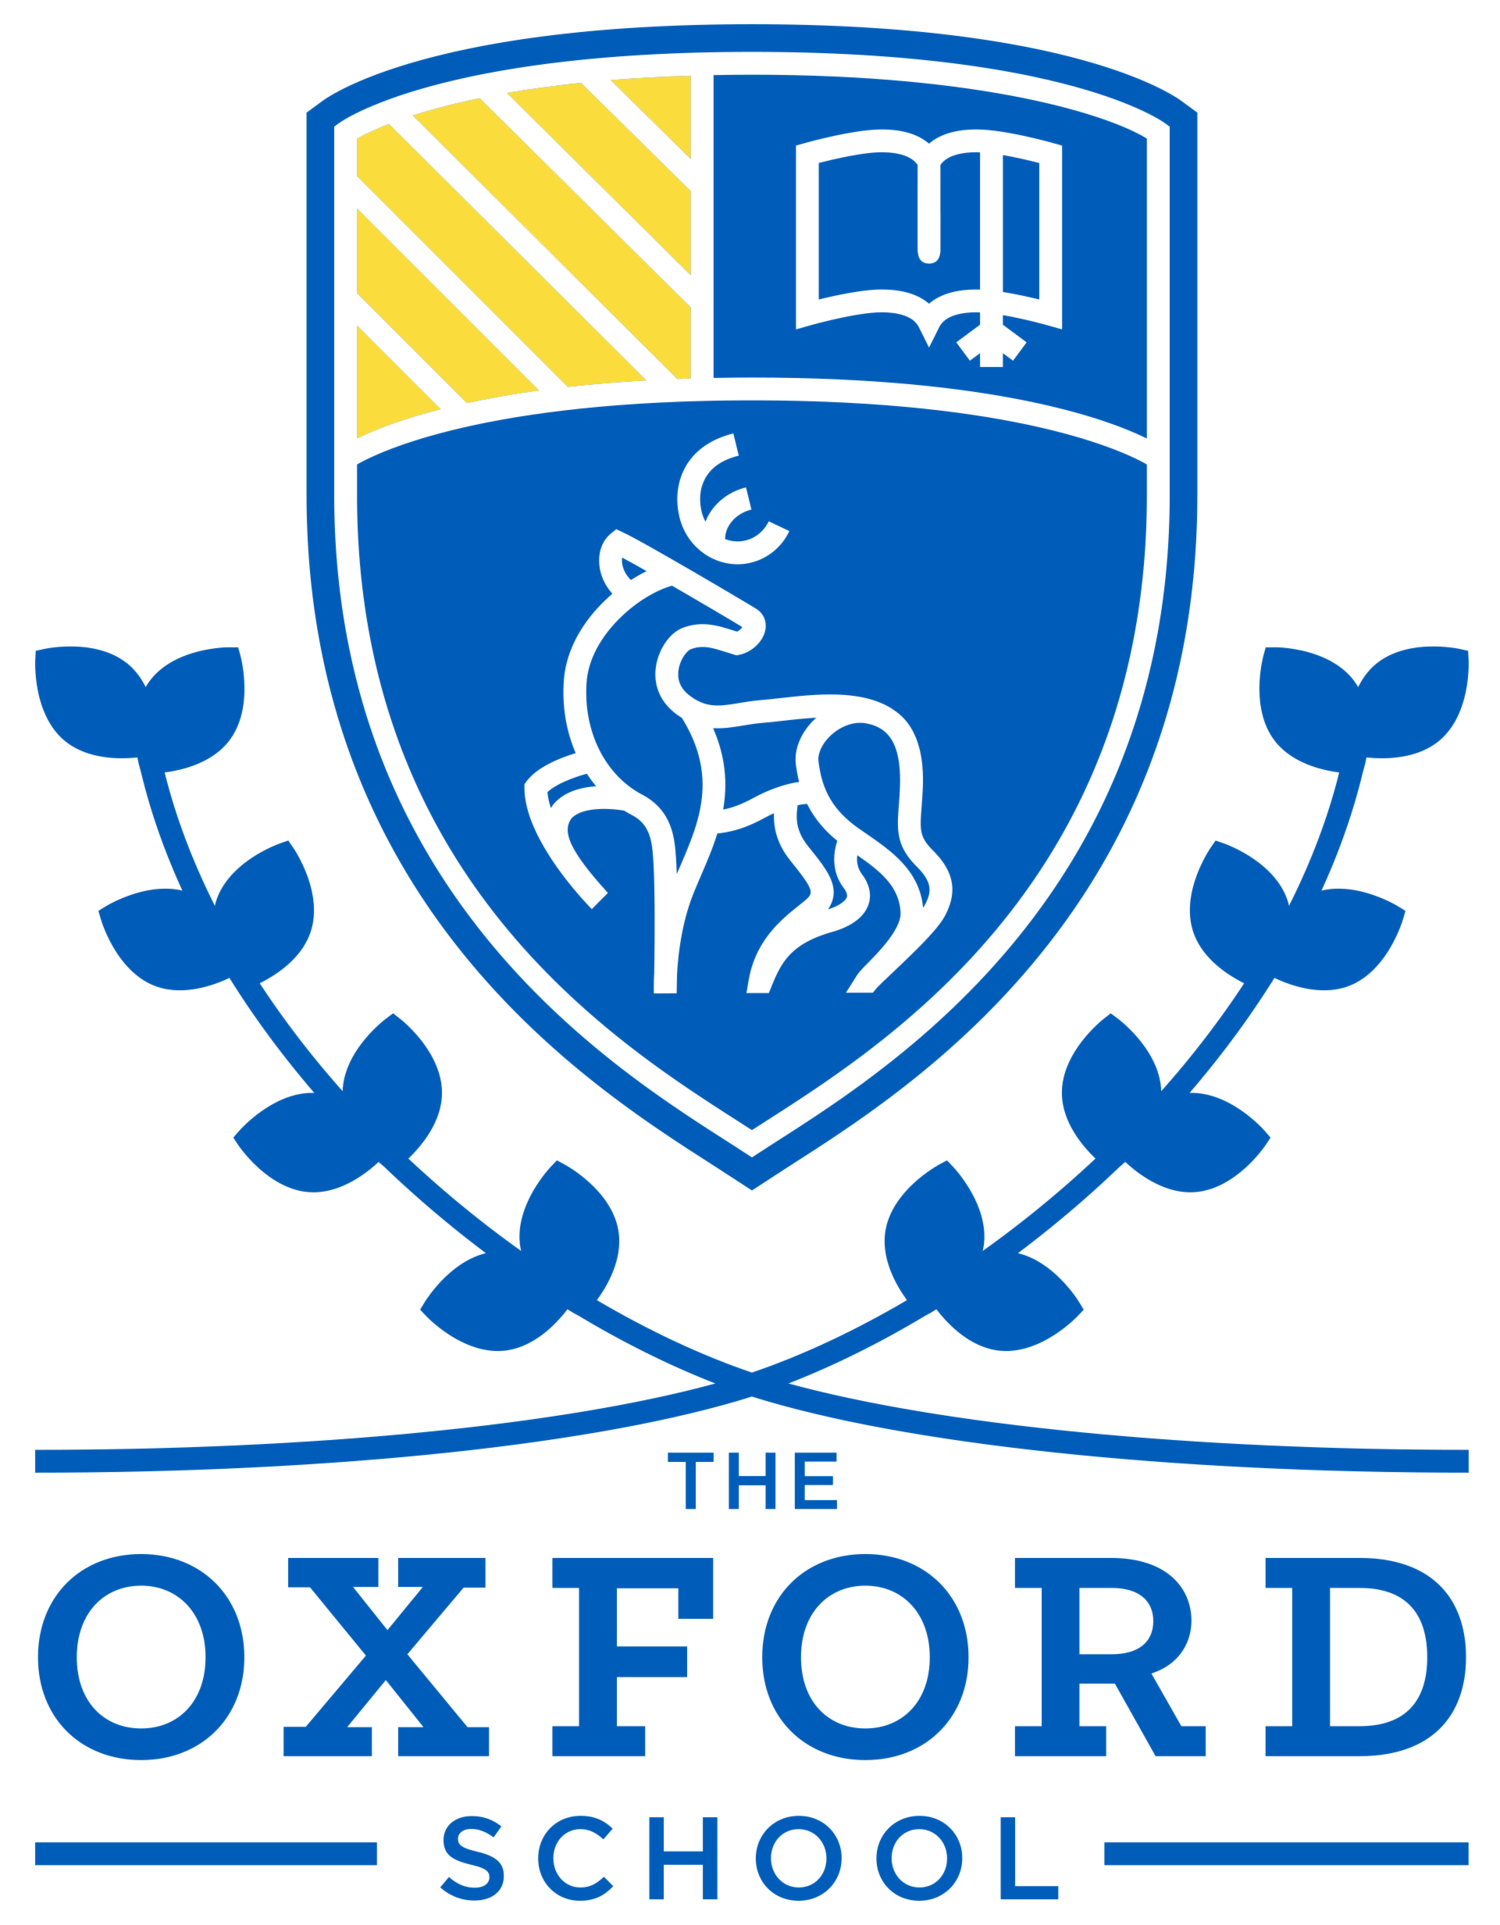 The Oxford School on SchoolAdvice